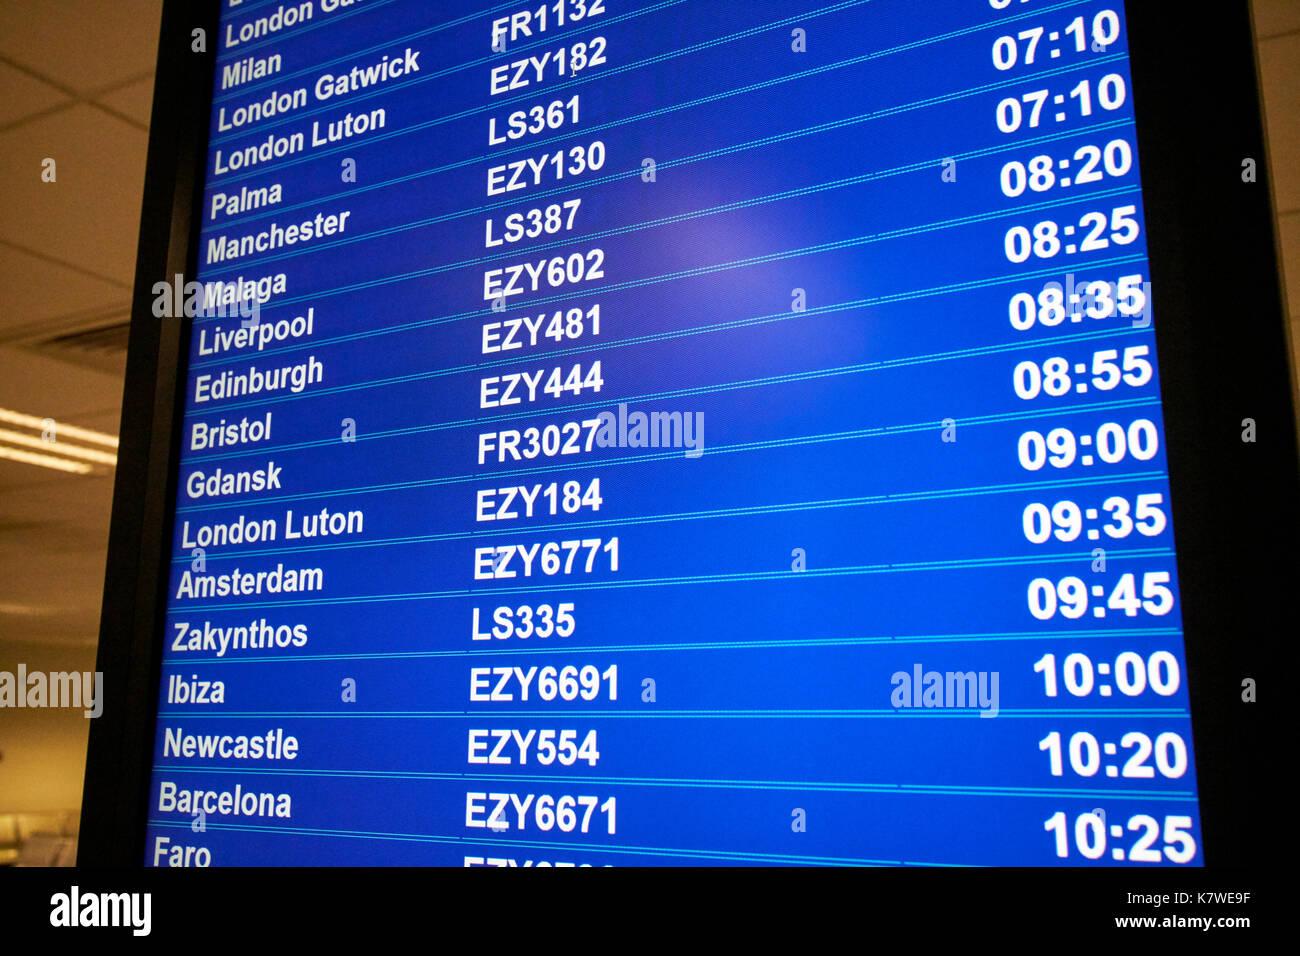 Airport Flight Information Screen Showing Destinations Low